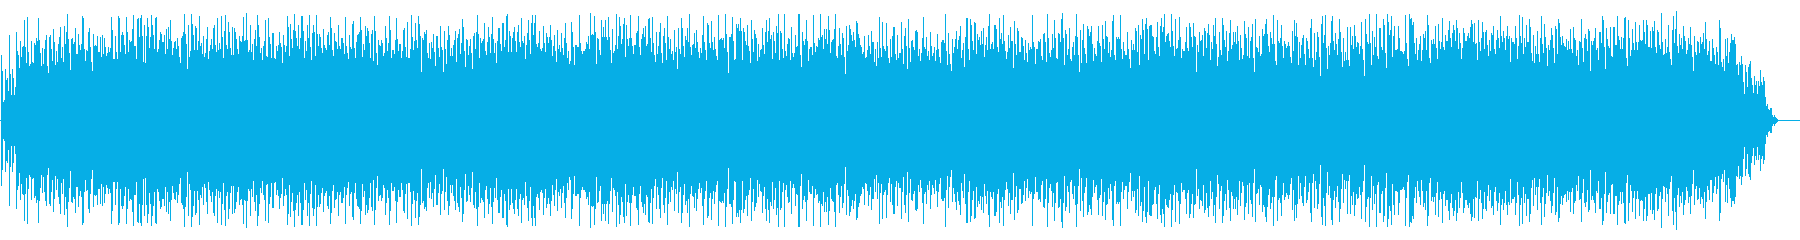 ★LoFi風味の★ジムノペディ第1番★の再生済みの波形